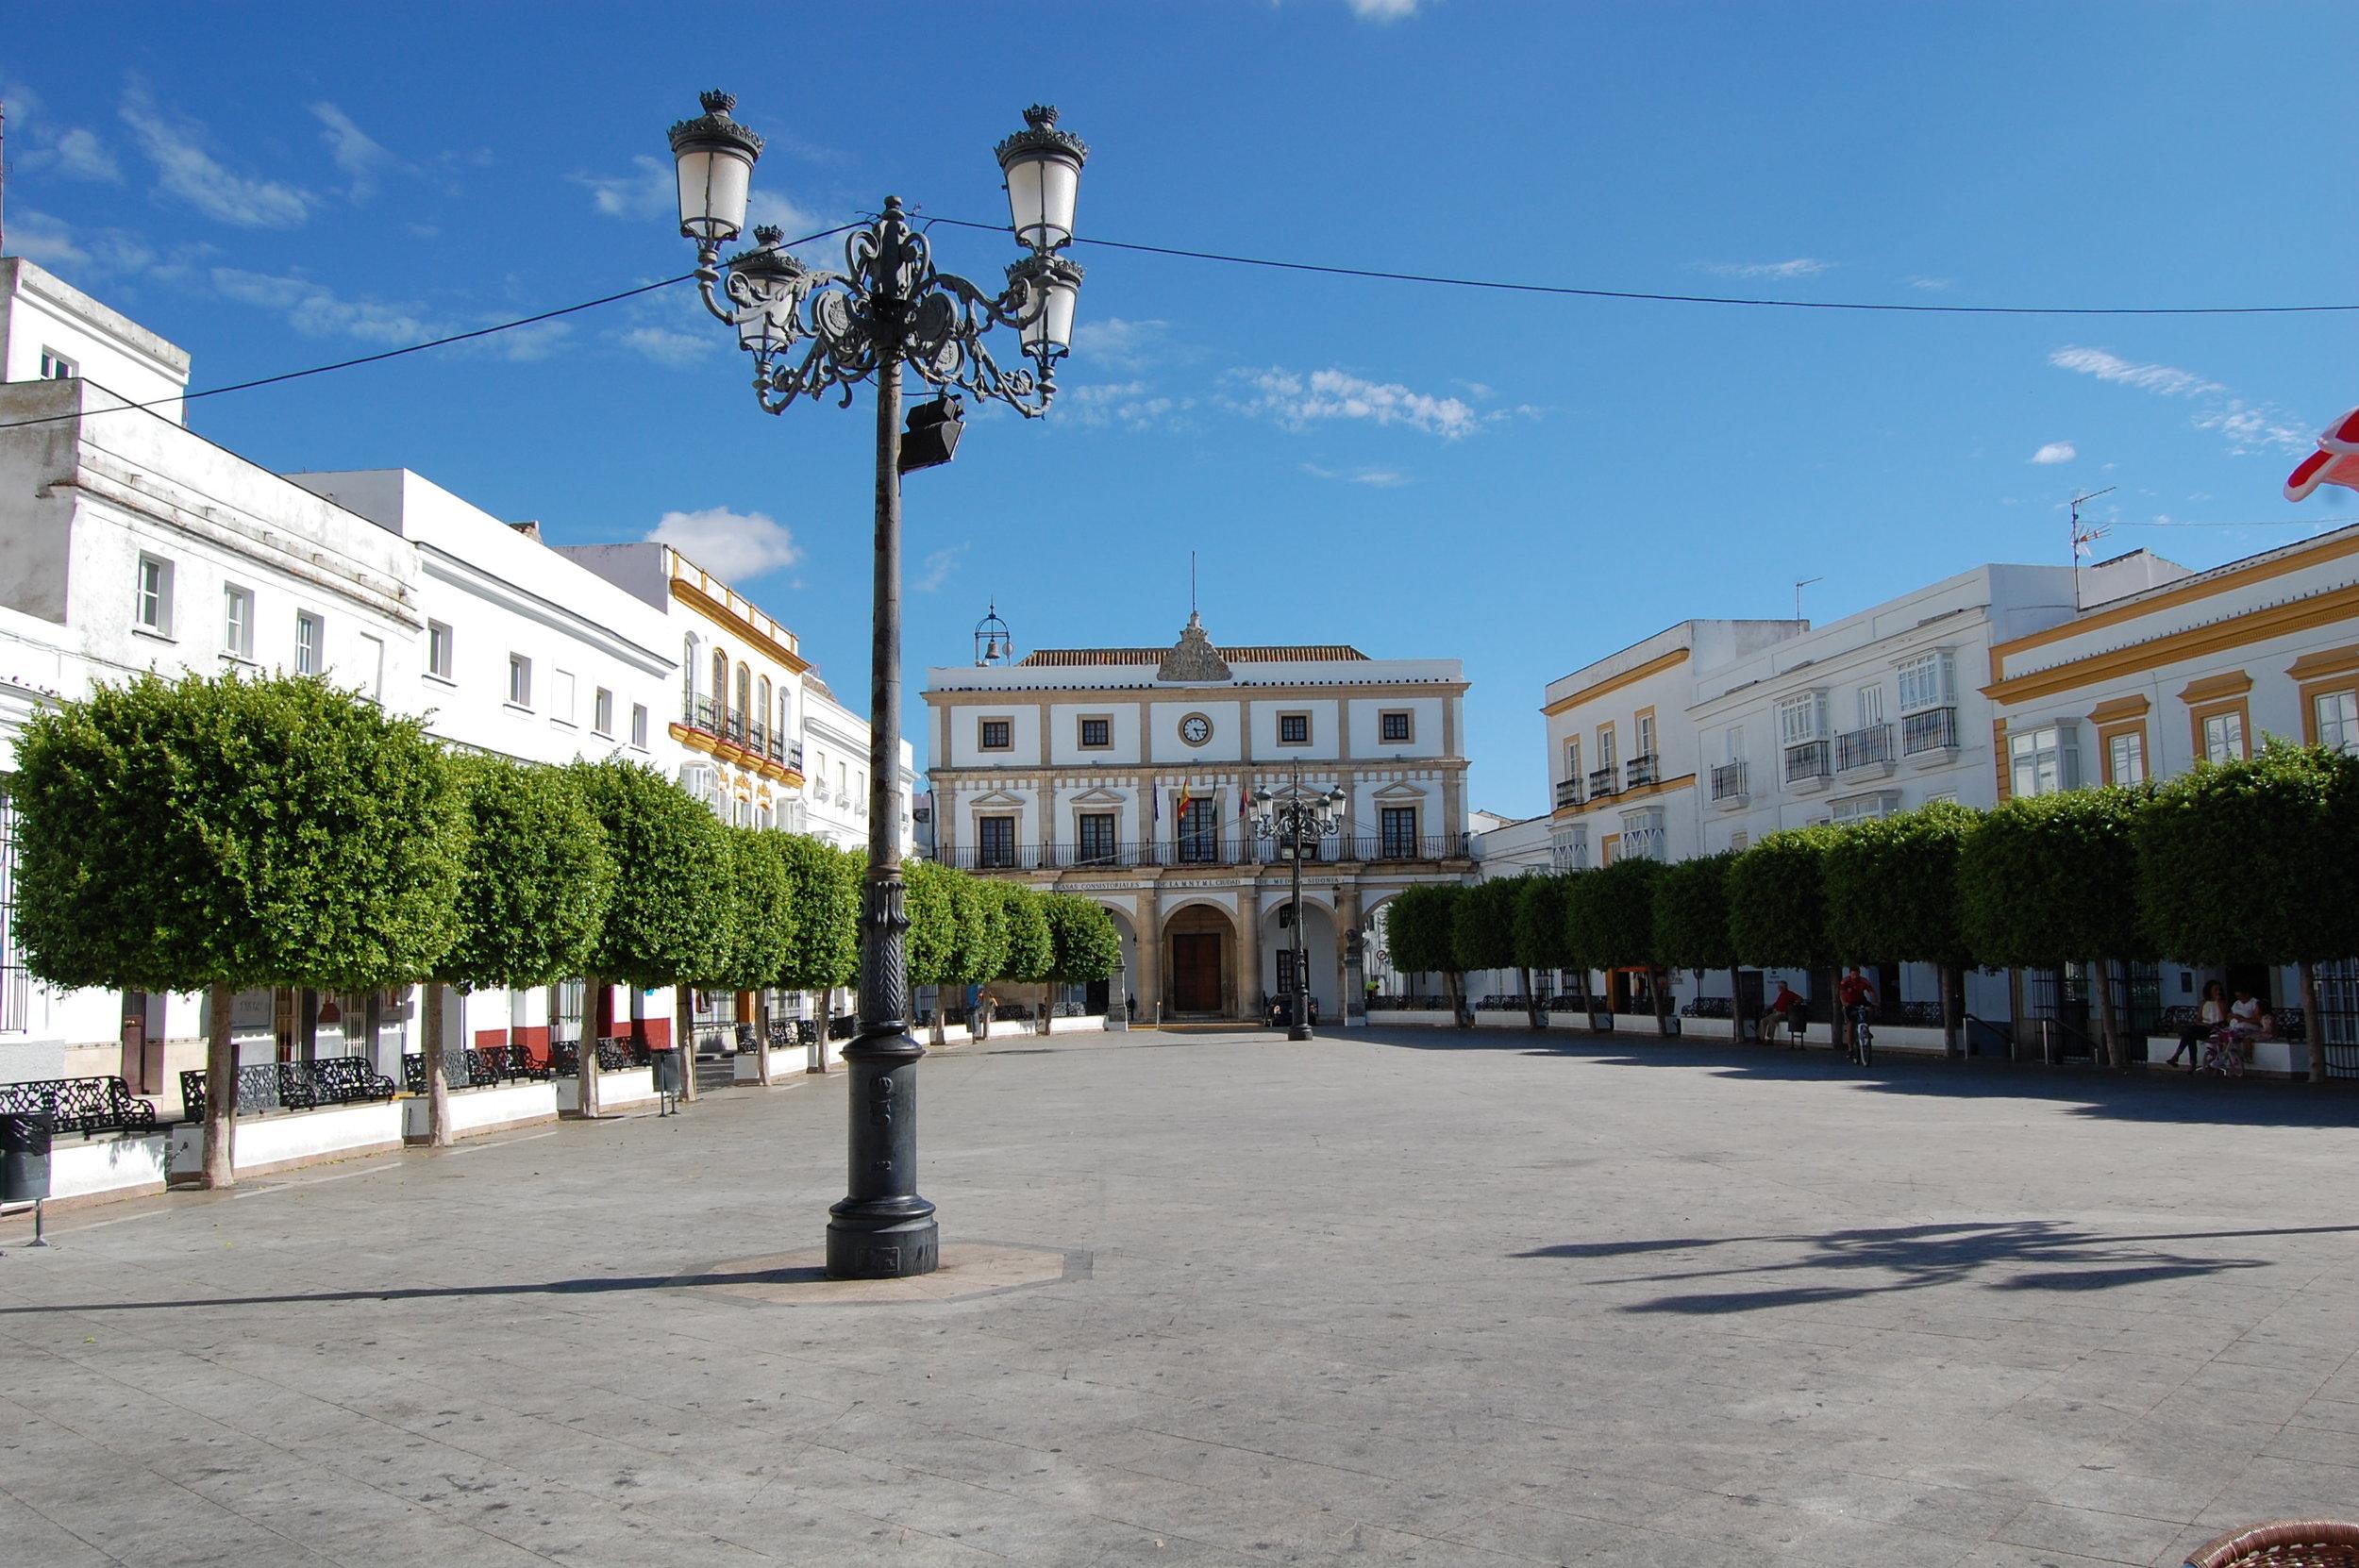 Medina Sidonia square